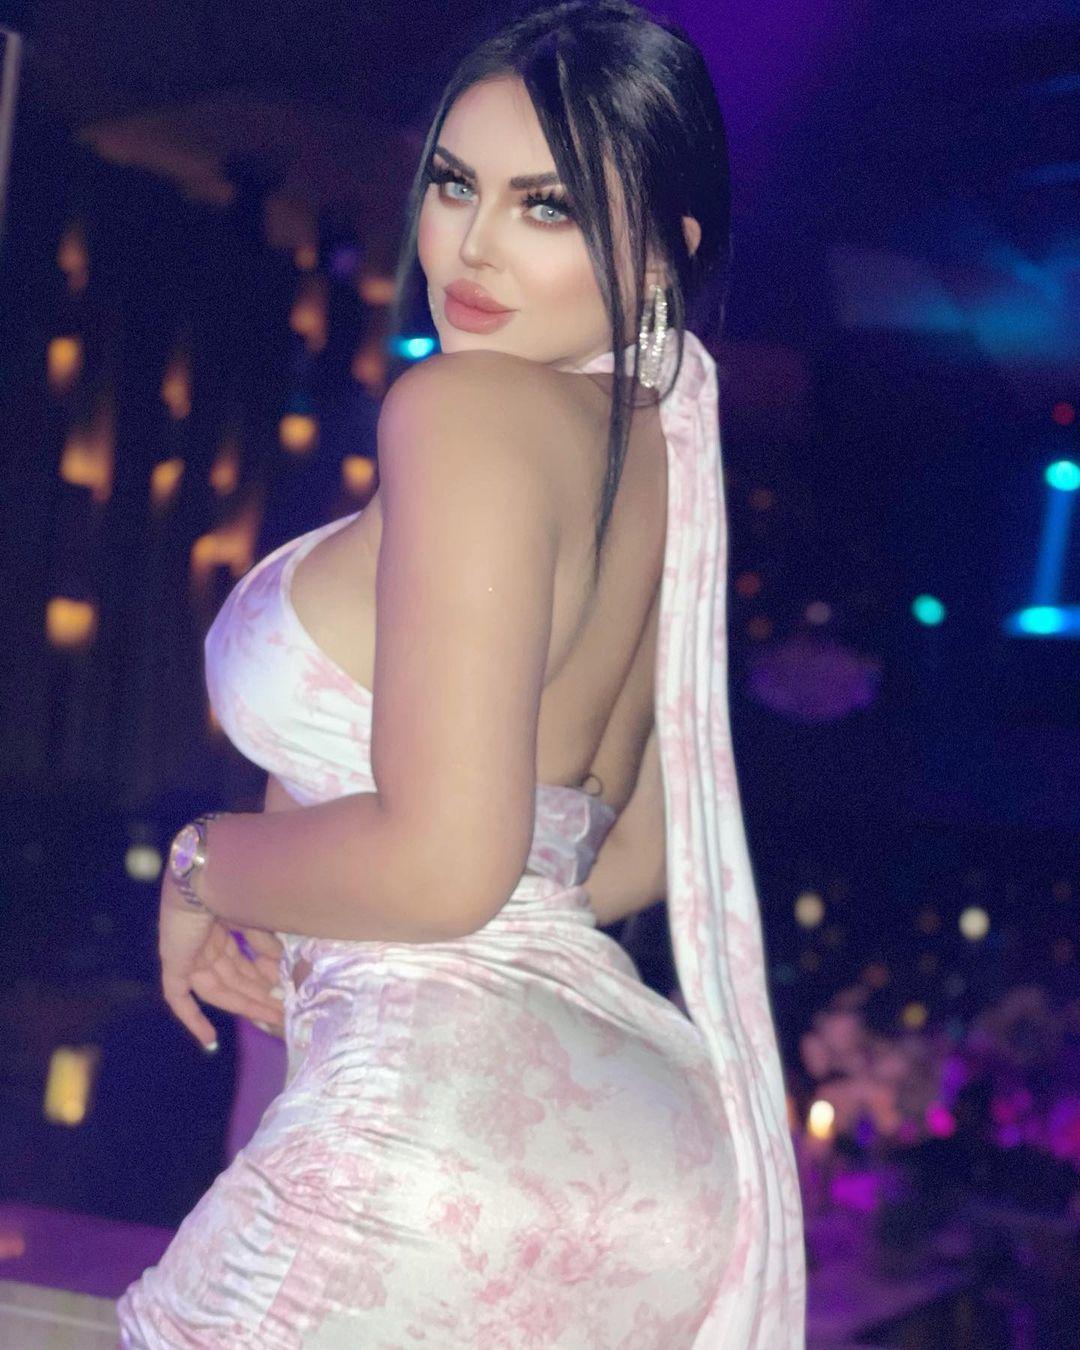 Chayma Allam DP